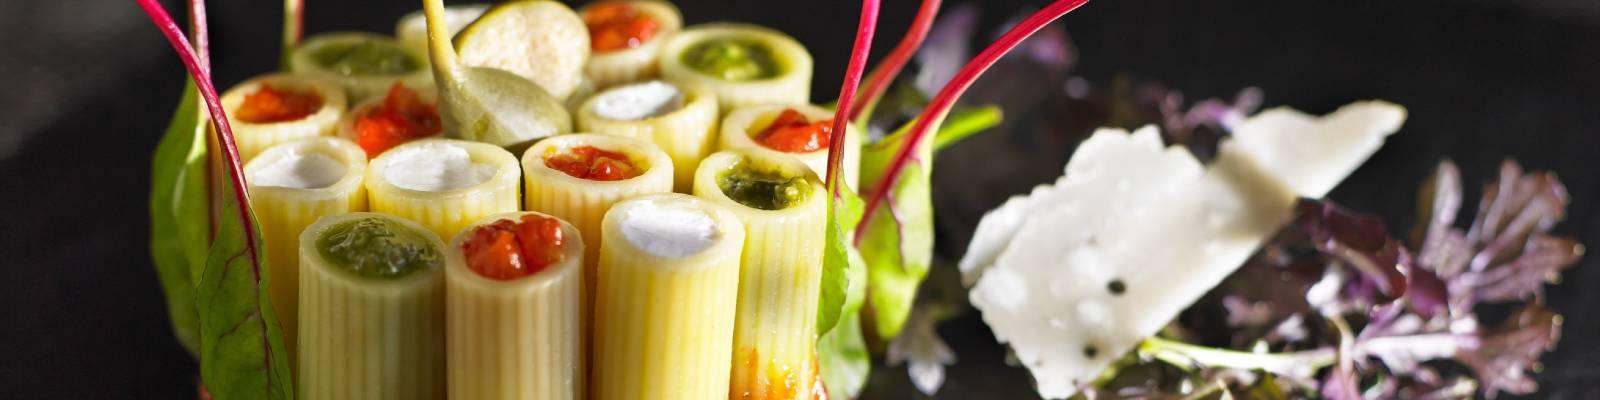 Pasta Garofalo - Fratelli d'Italia en Rigatoni